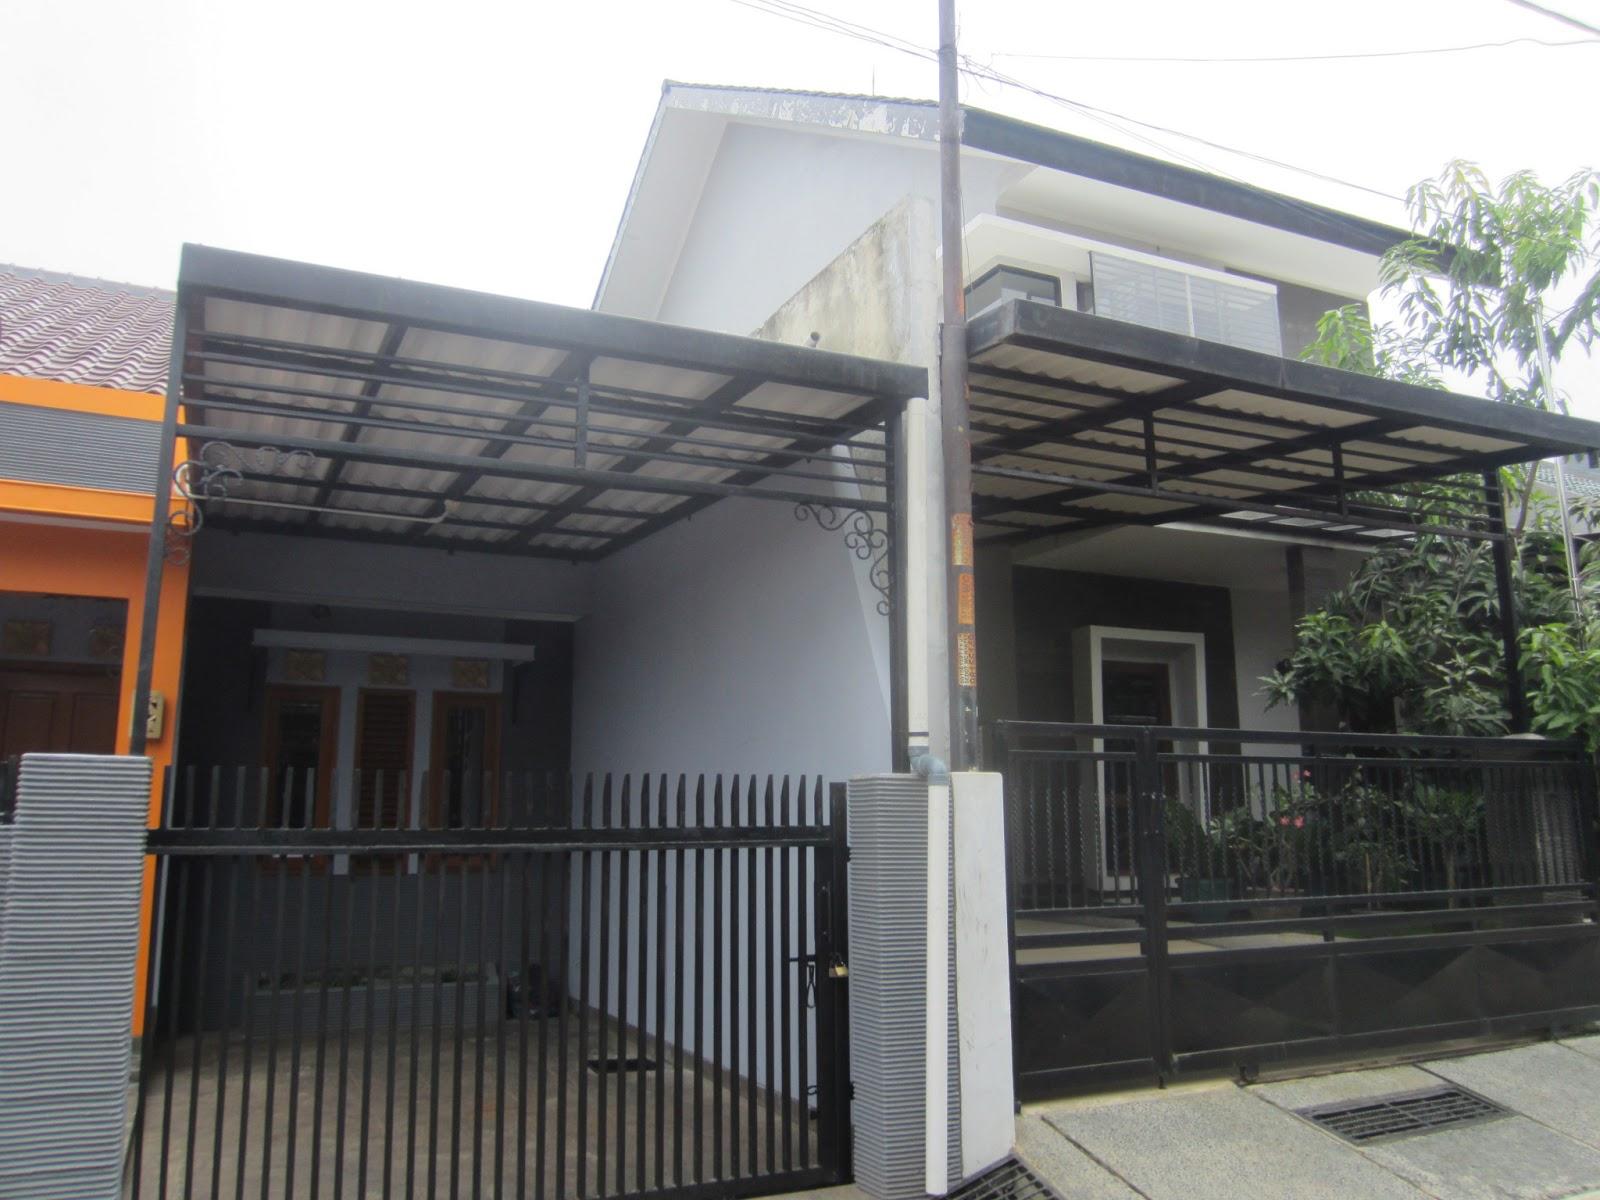 Jual Pemasangan Kanopi Atap Solarlite 4mm MPM INDONESIA Tokopedia